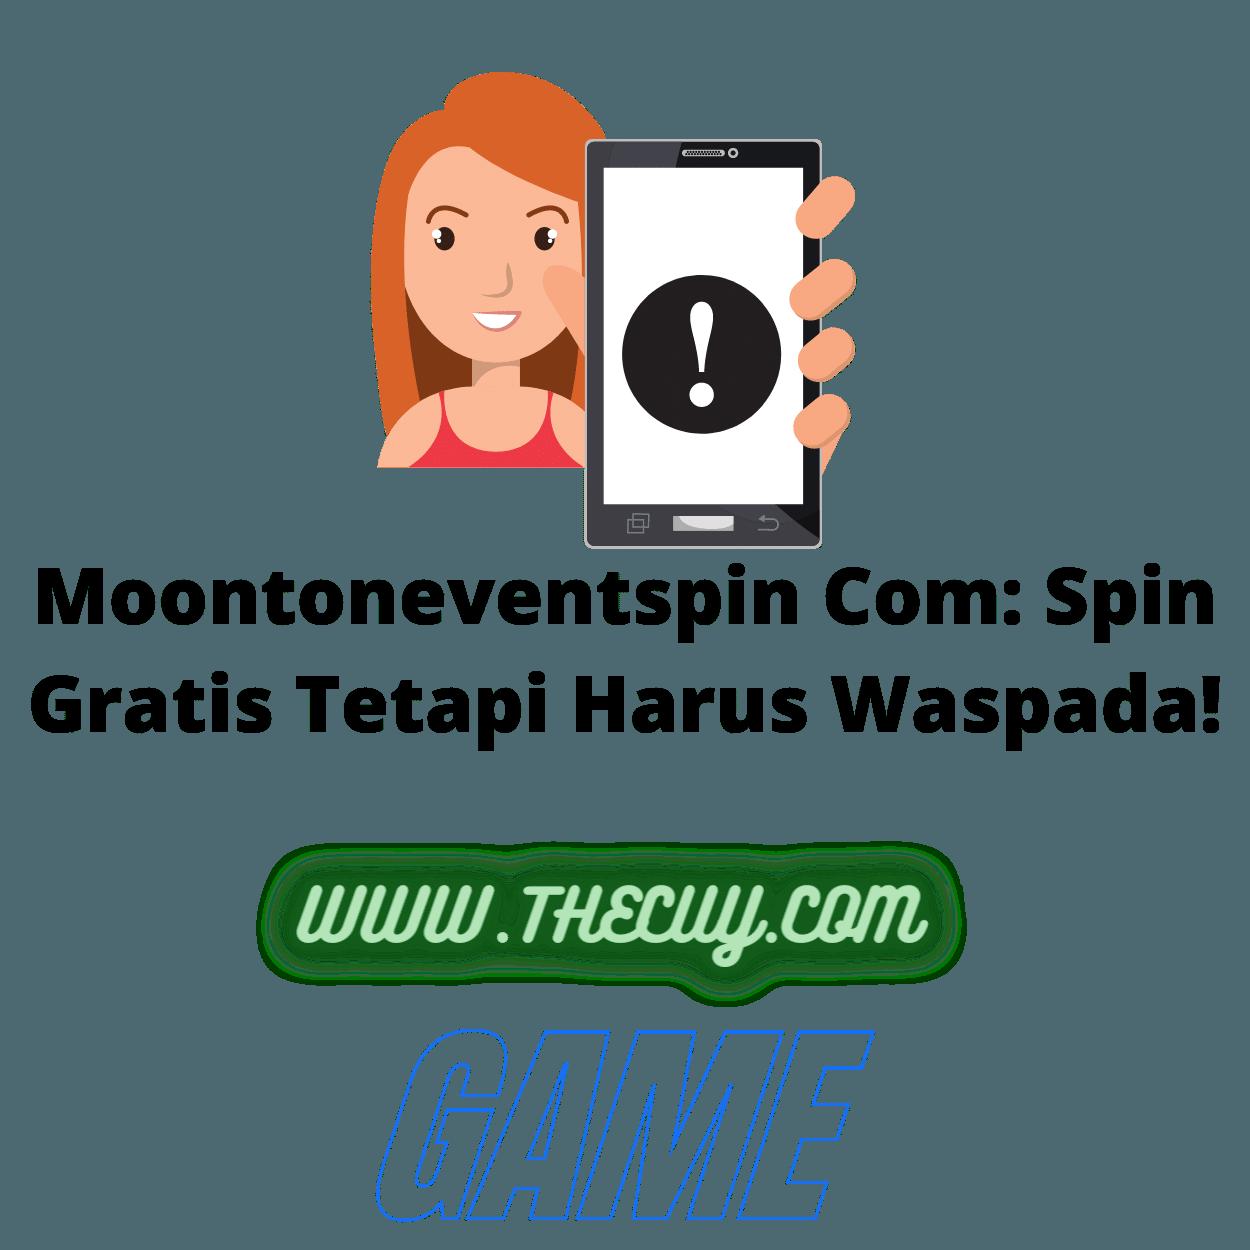 Moontoneventspin Com: Spin Gratis Tetapi Harus Waspada!